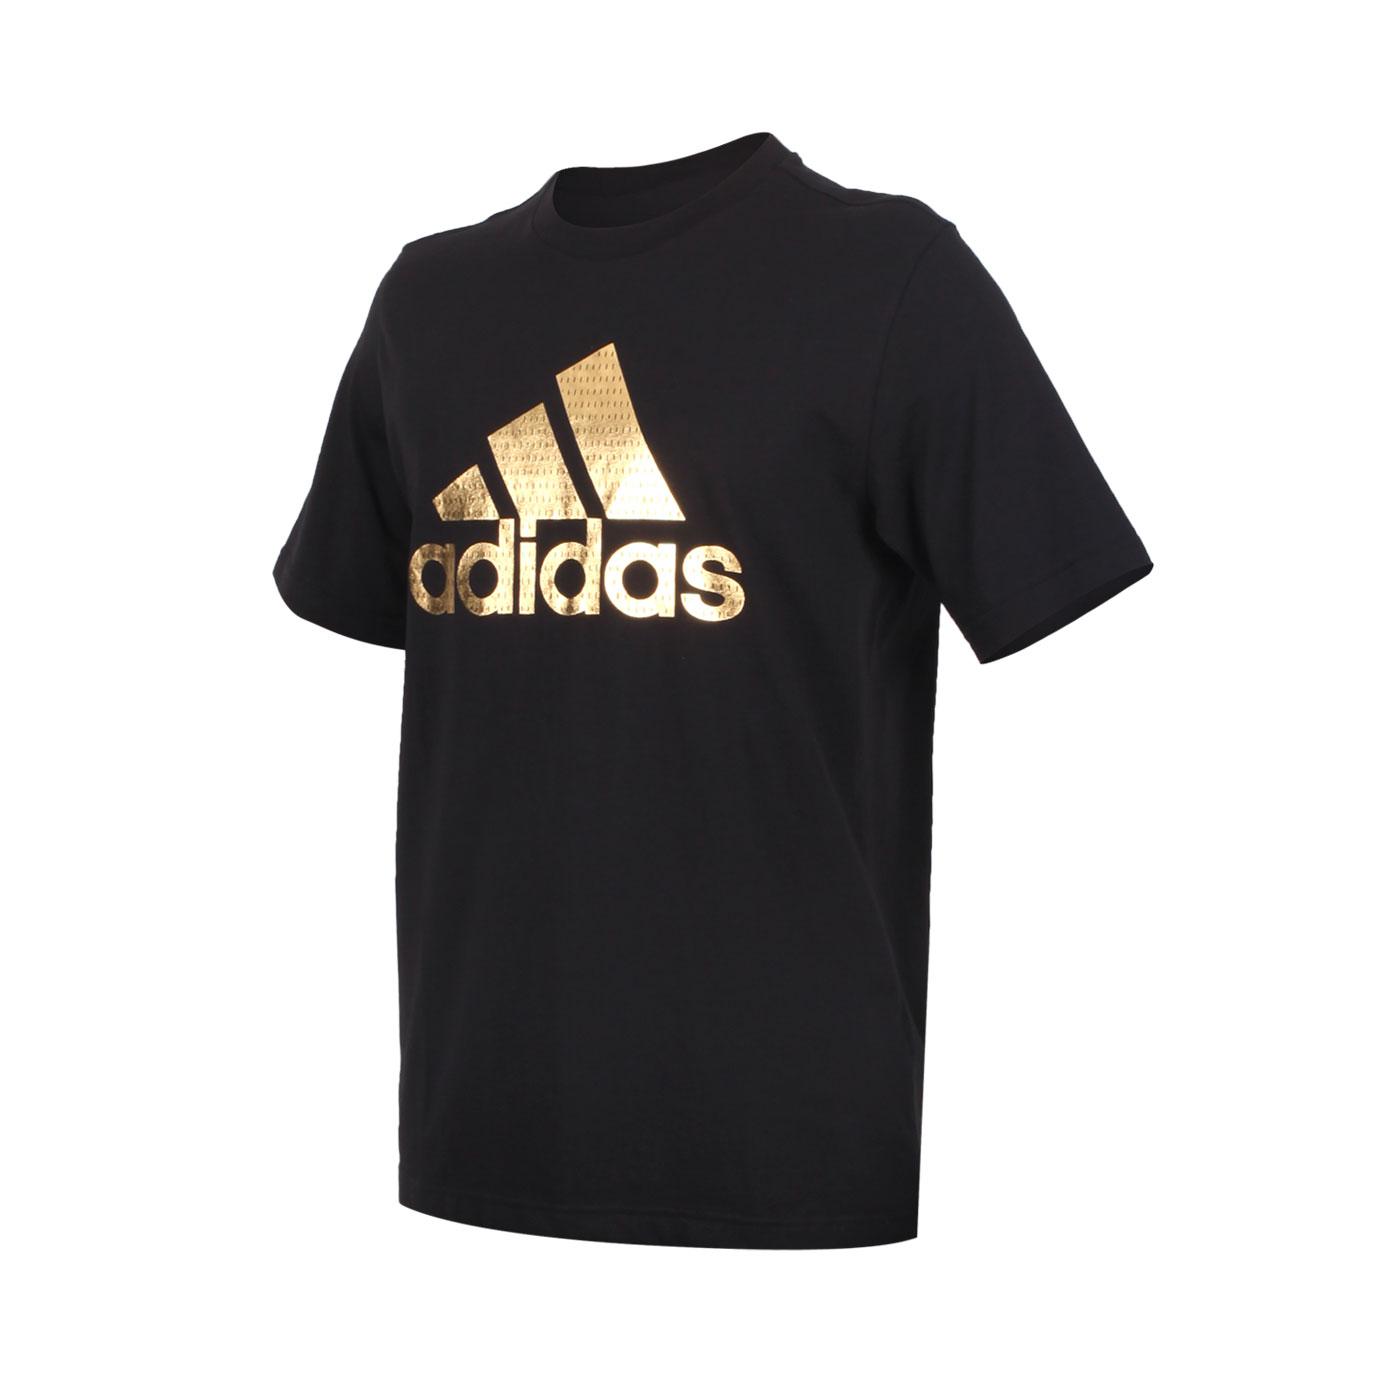 ADIDAS 男款短袖T恤 GE4688 - 黑金